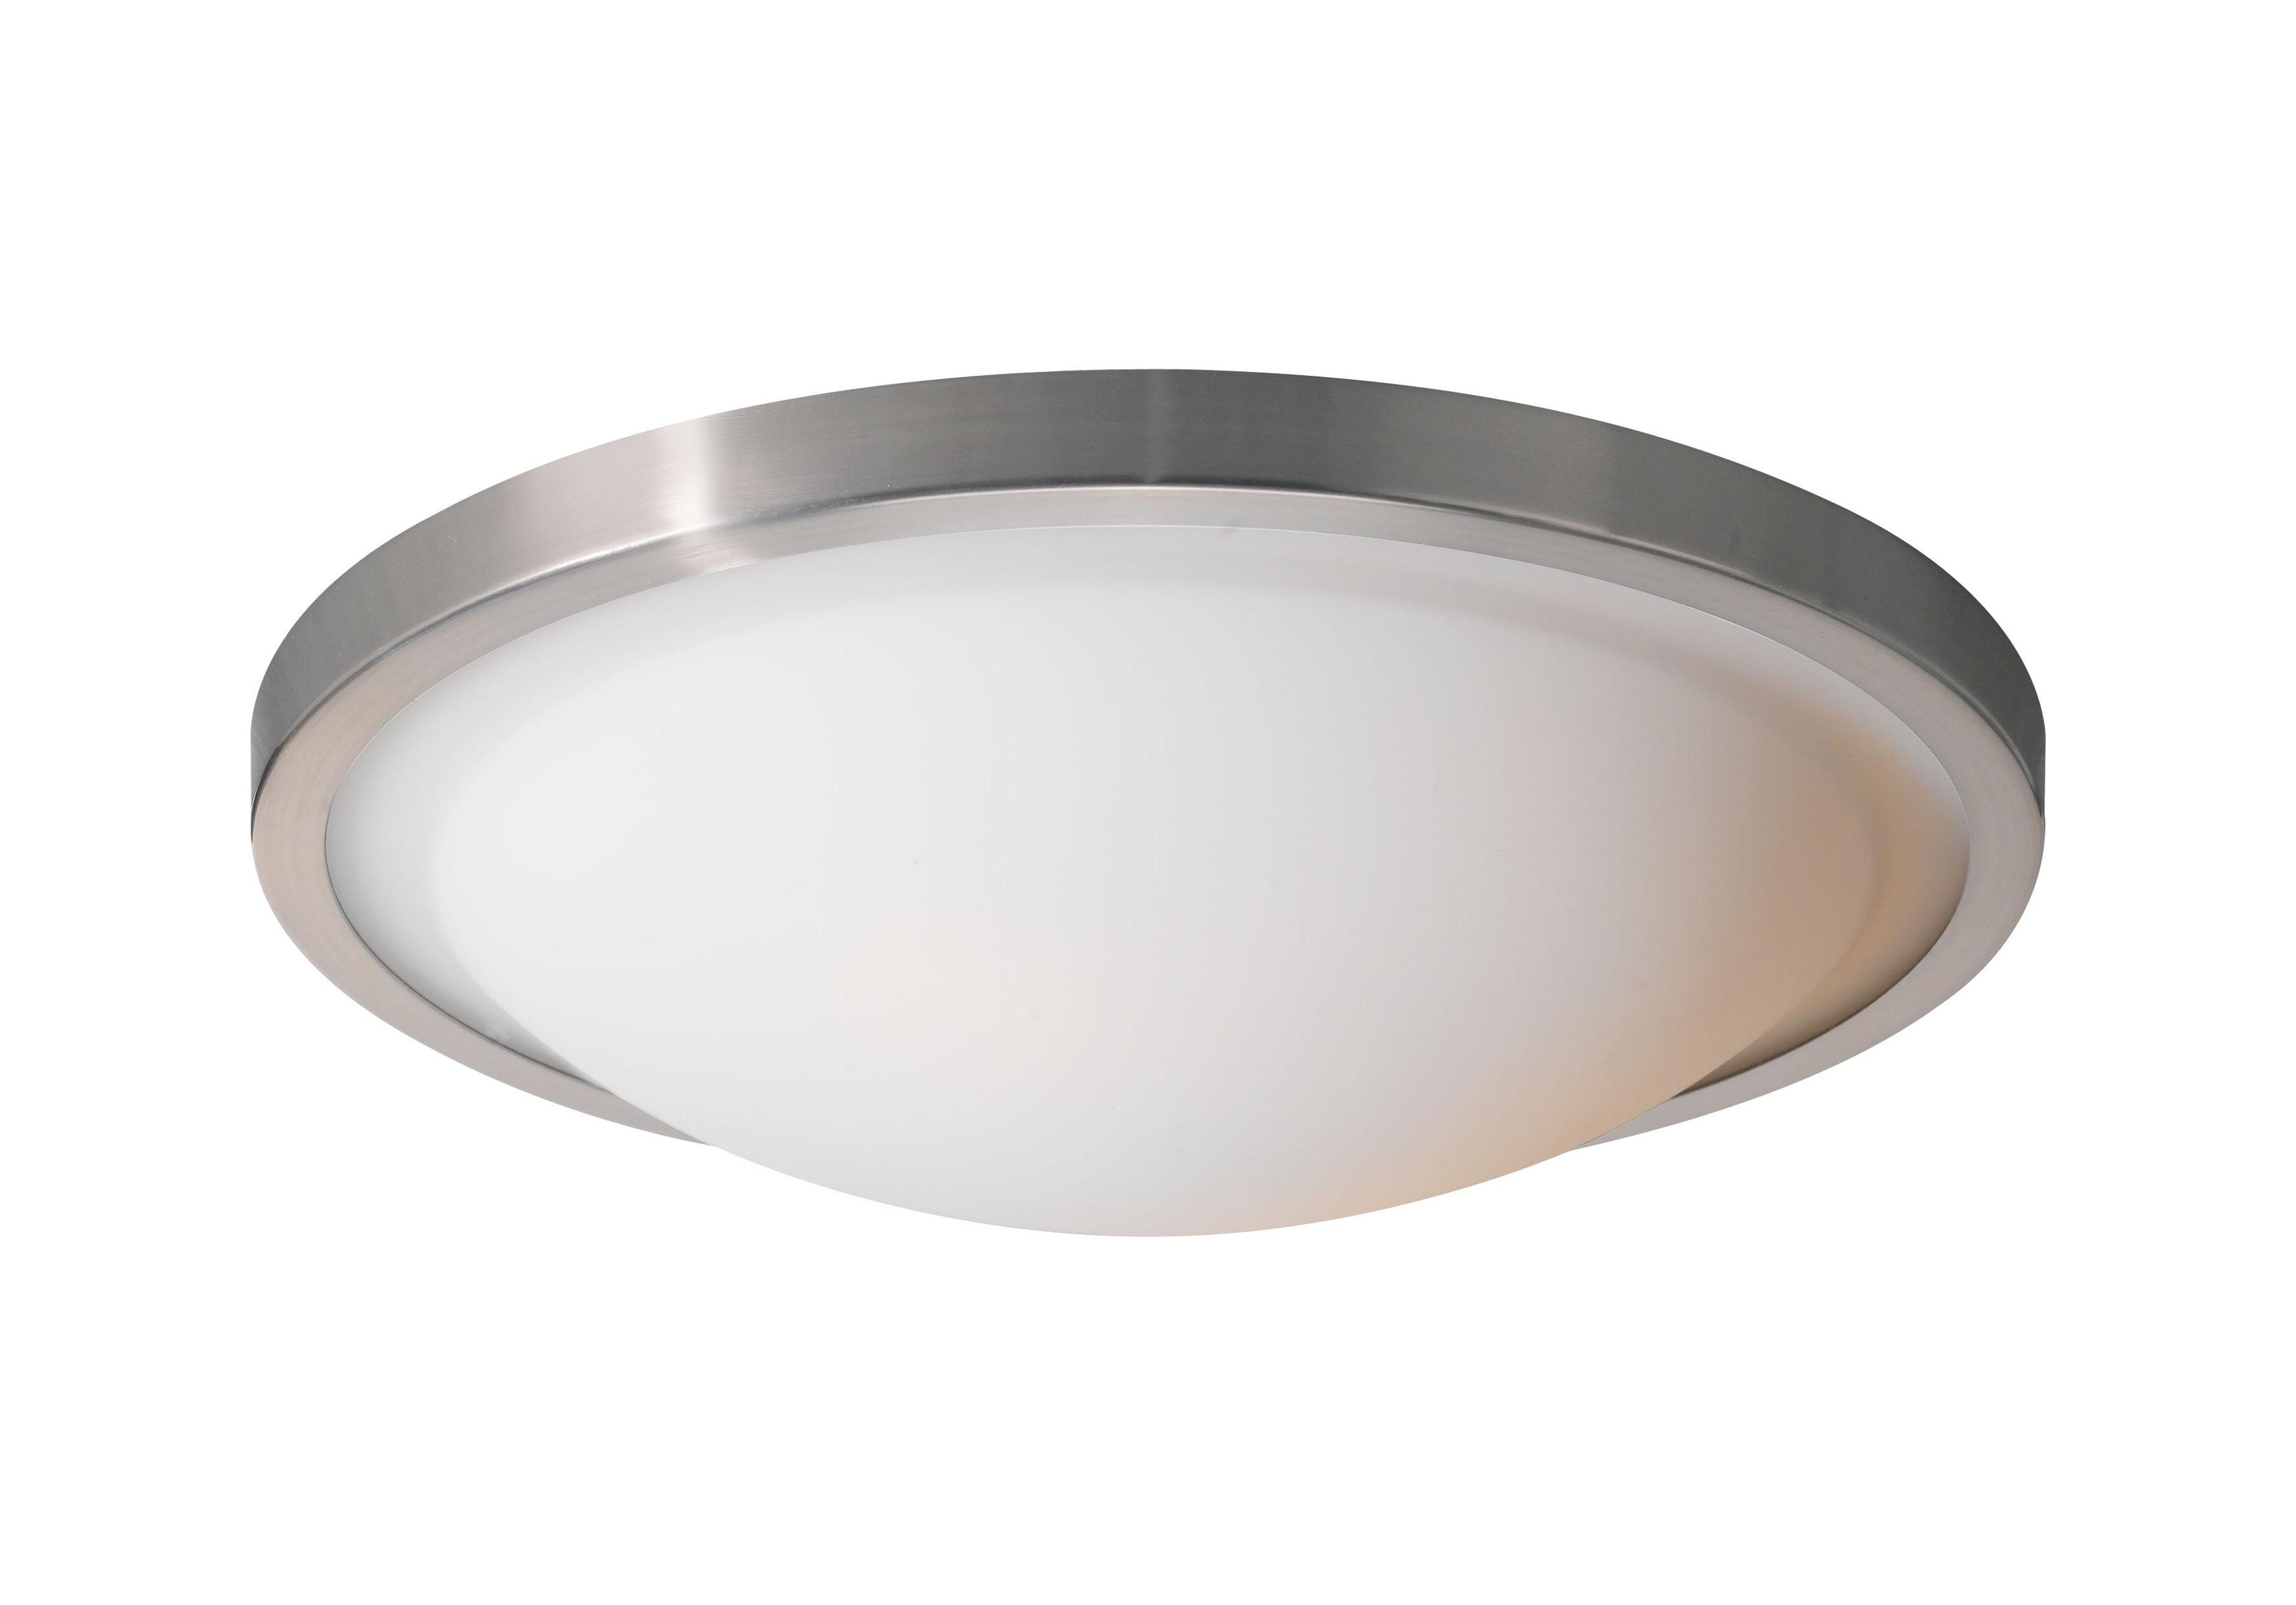 Woodbridge Lighting Energy Saving 2-light Satin Nickel Flush Mount